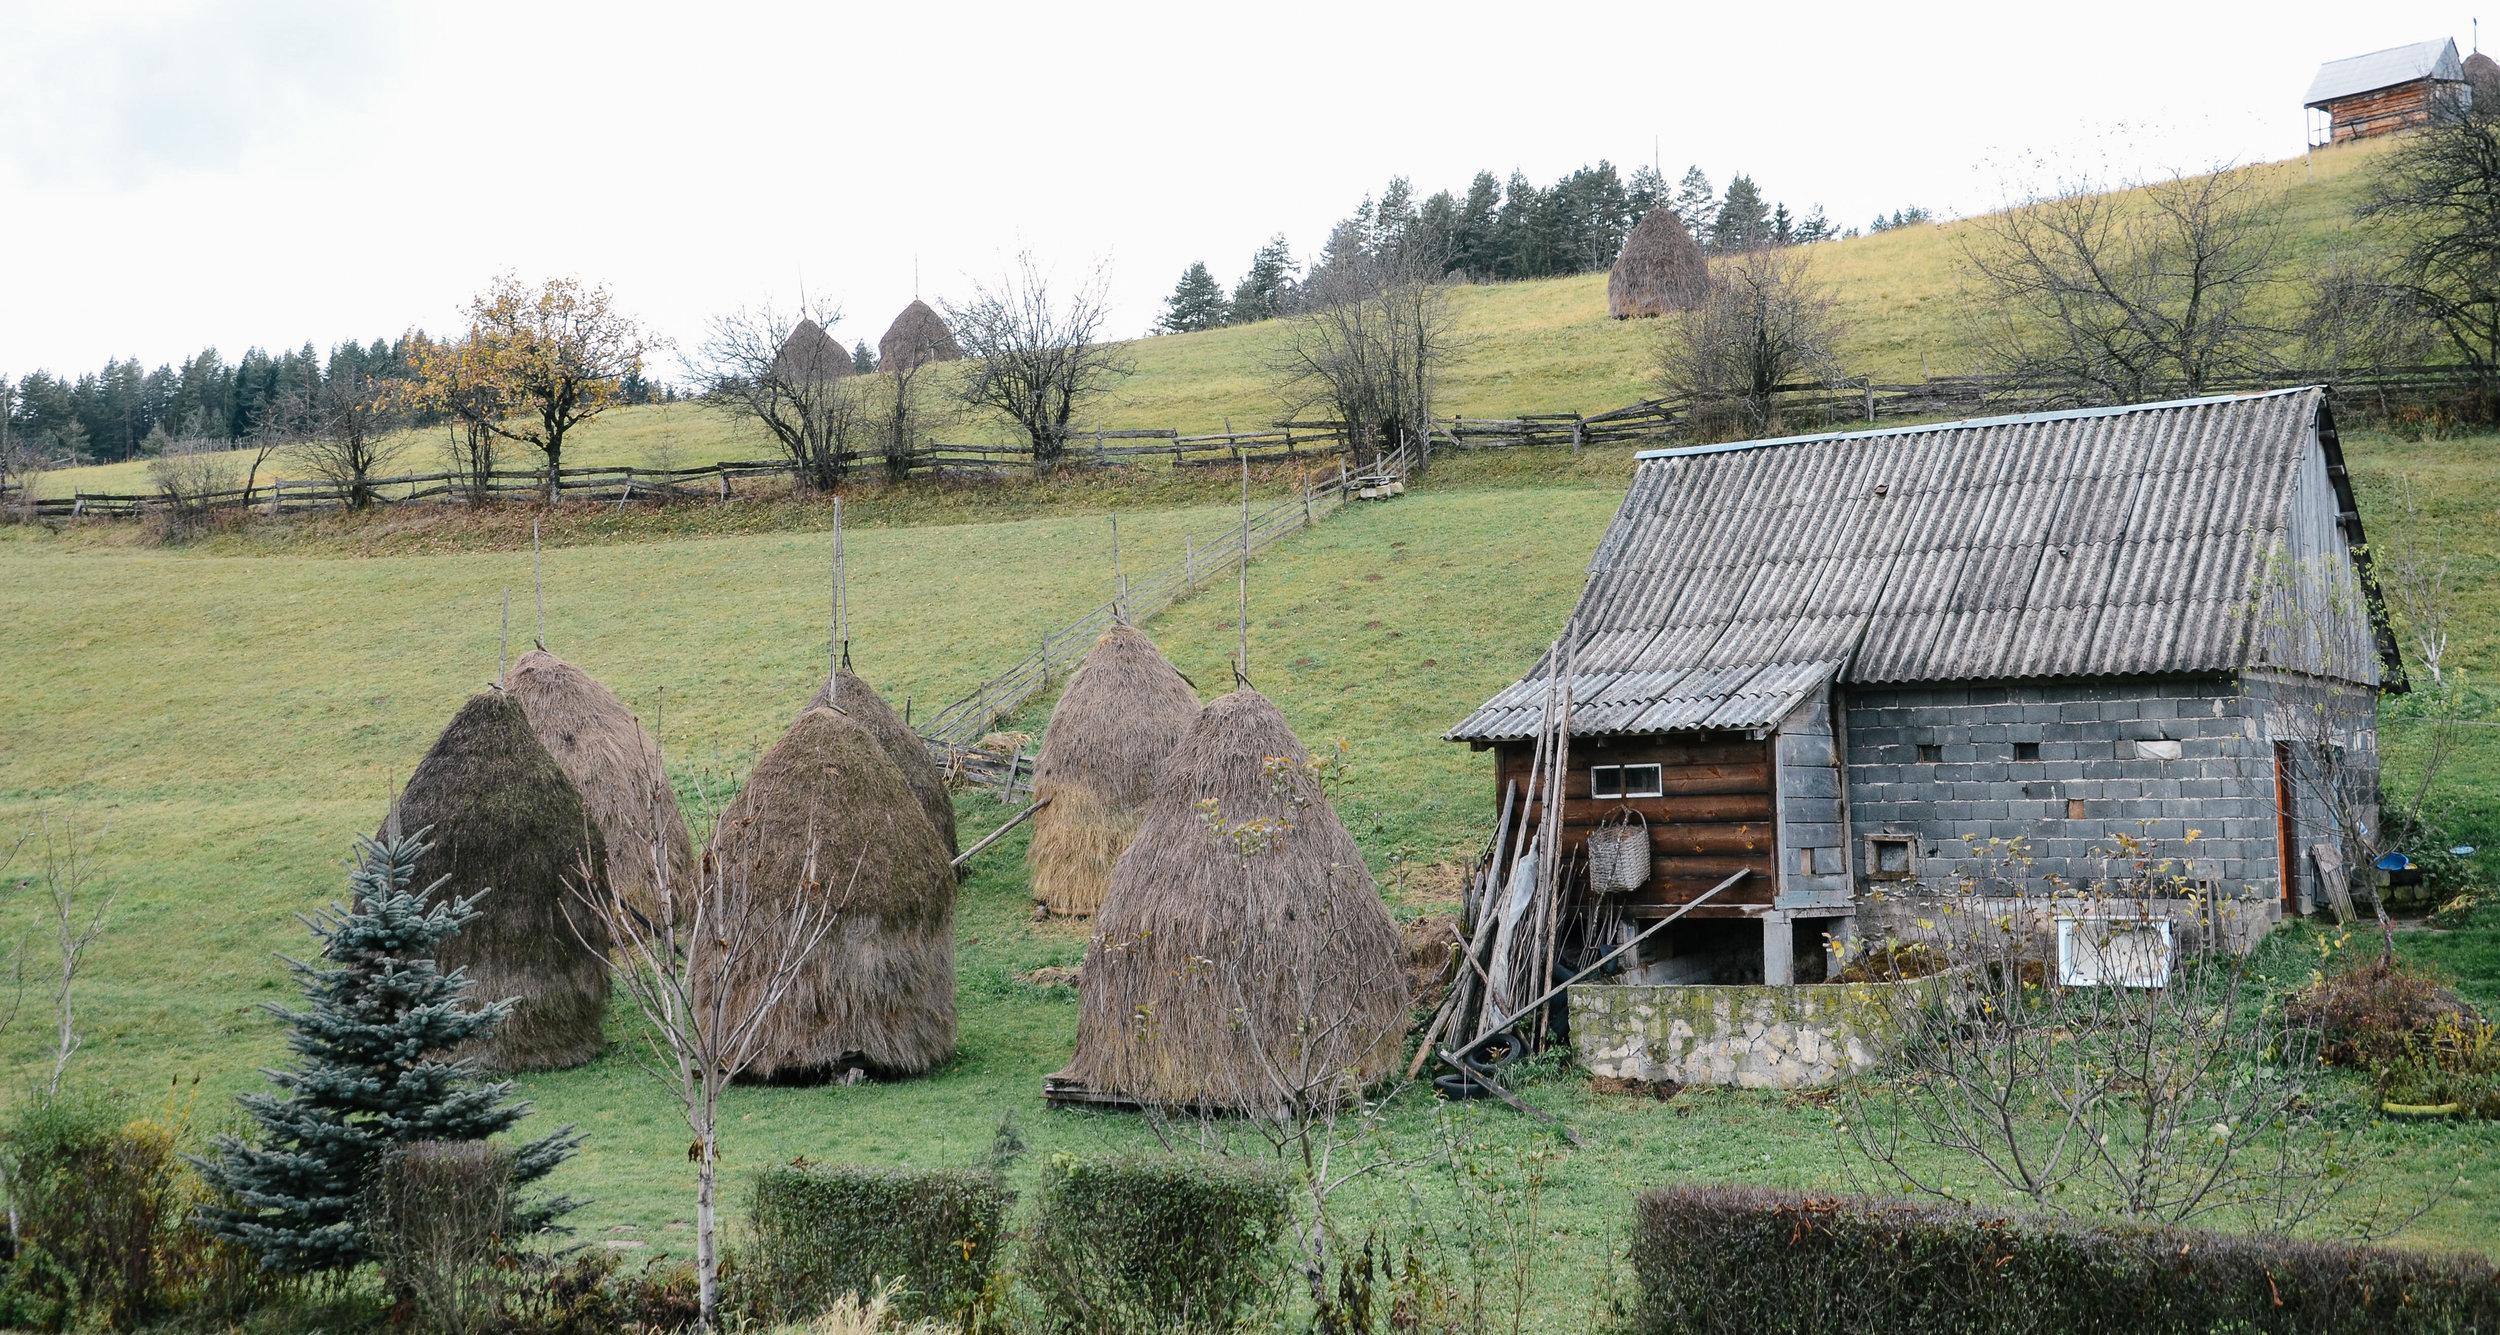 mostar-bosnia-travel-guide-lifeonpine_DSC_3403.jpg